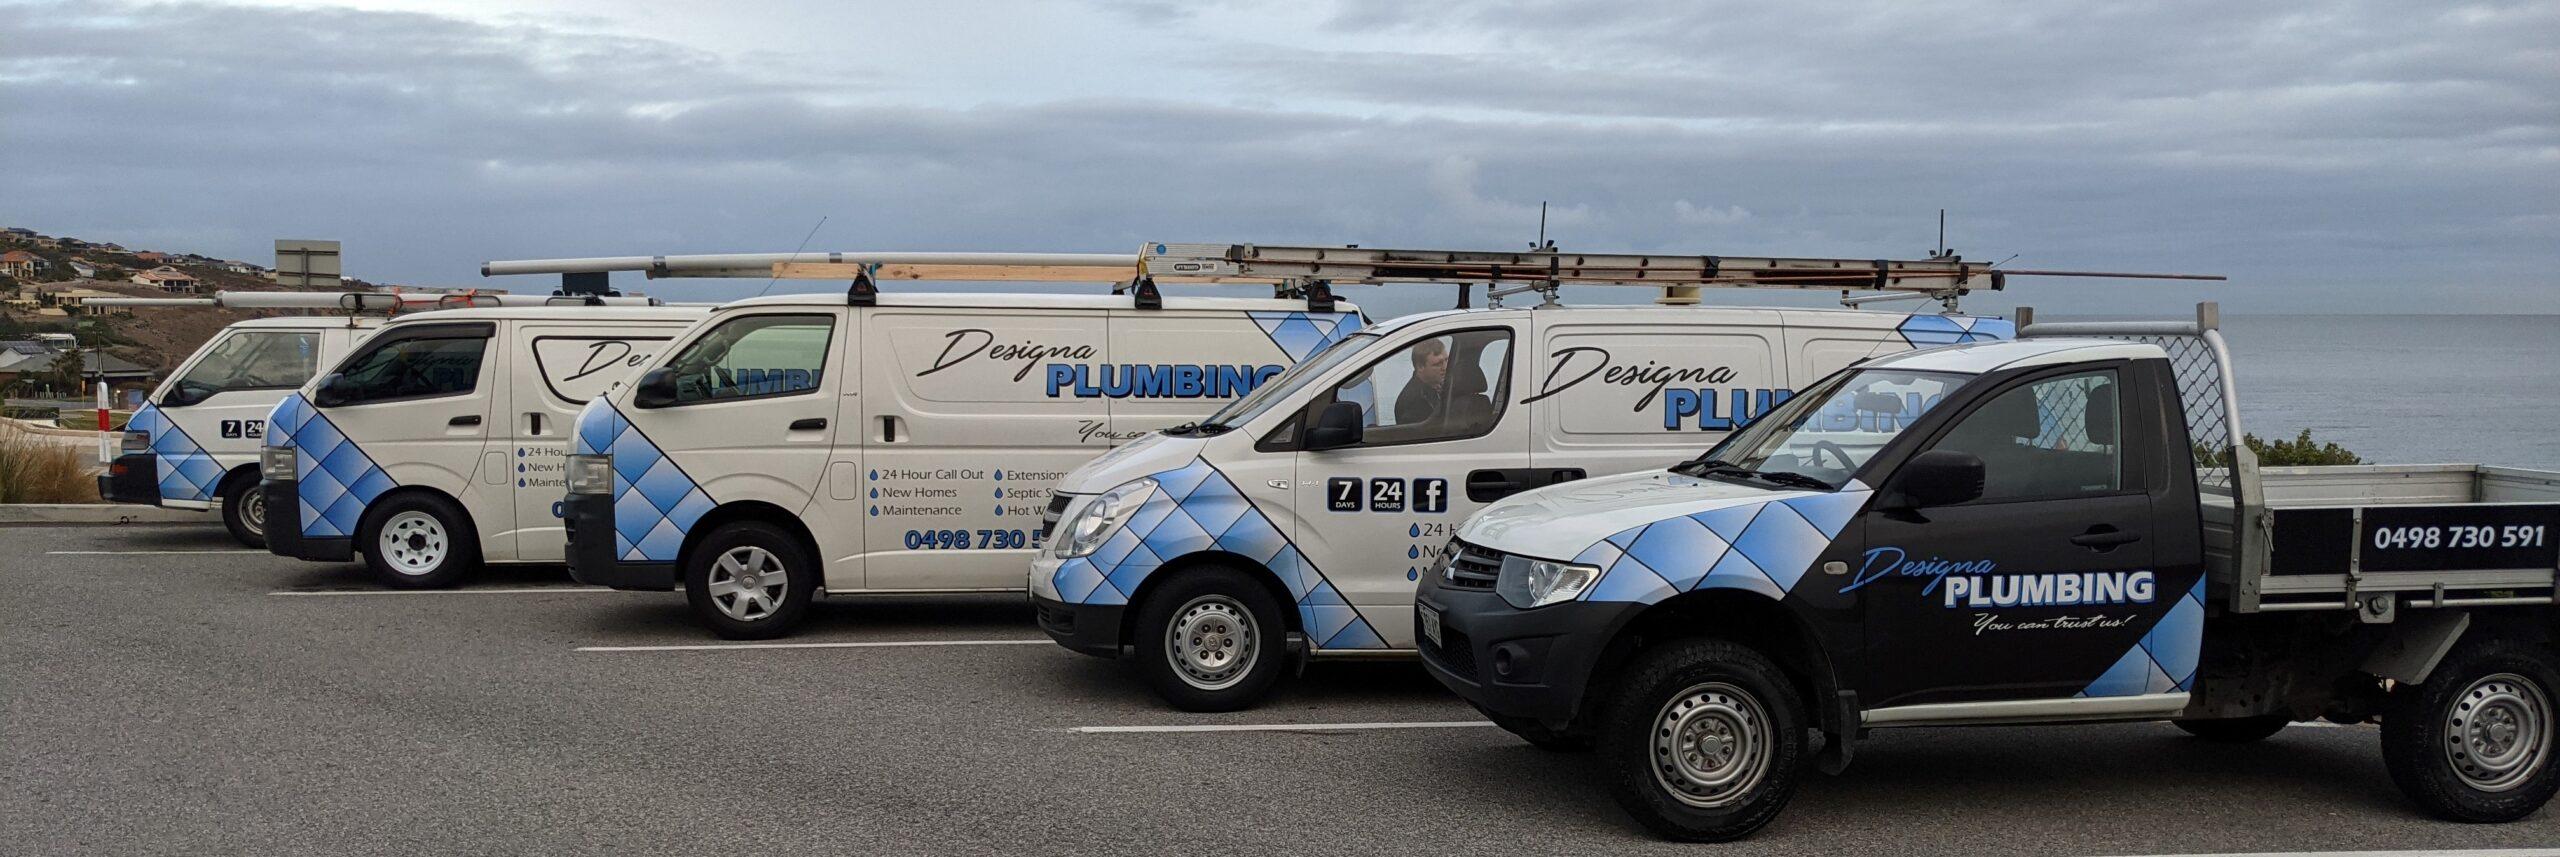 Emergency Plumbers | Gas Plumber Adelaide | Designa Plumbing